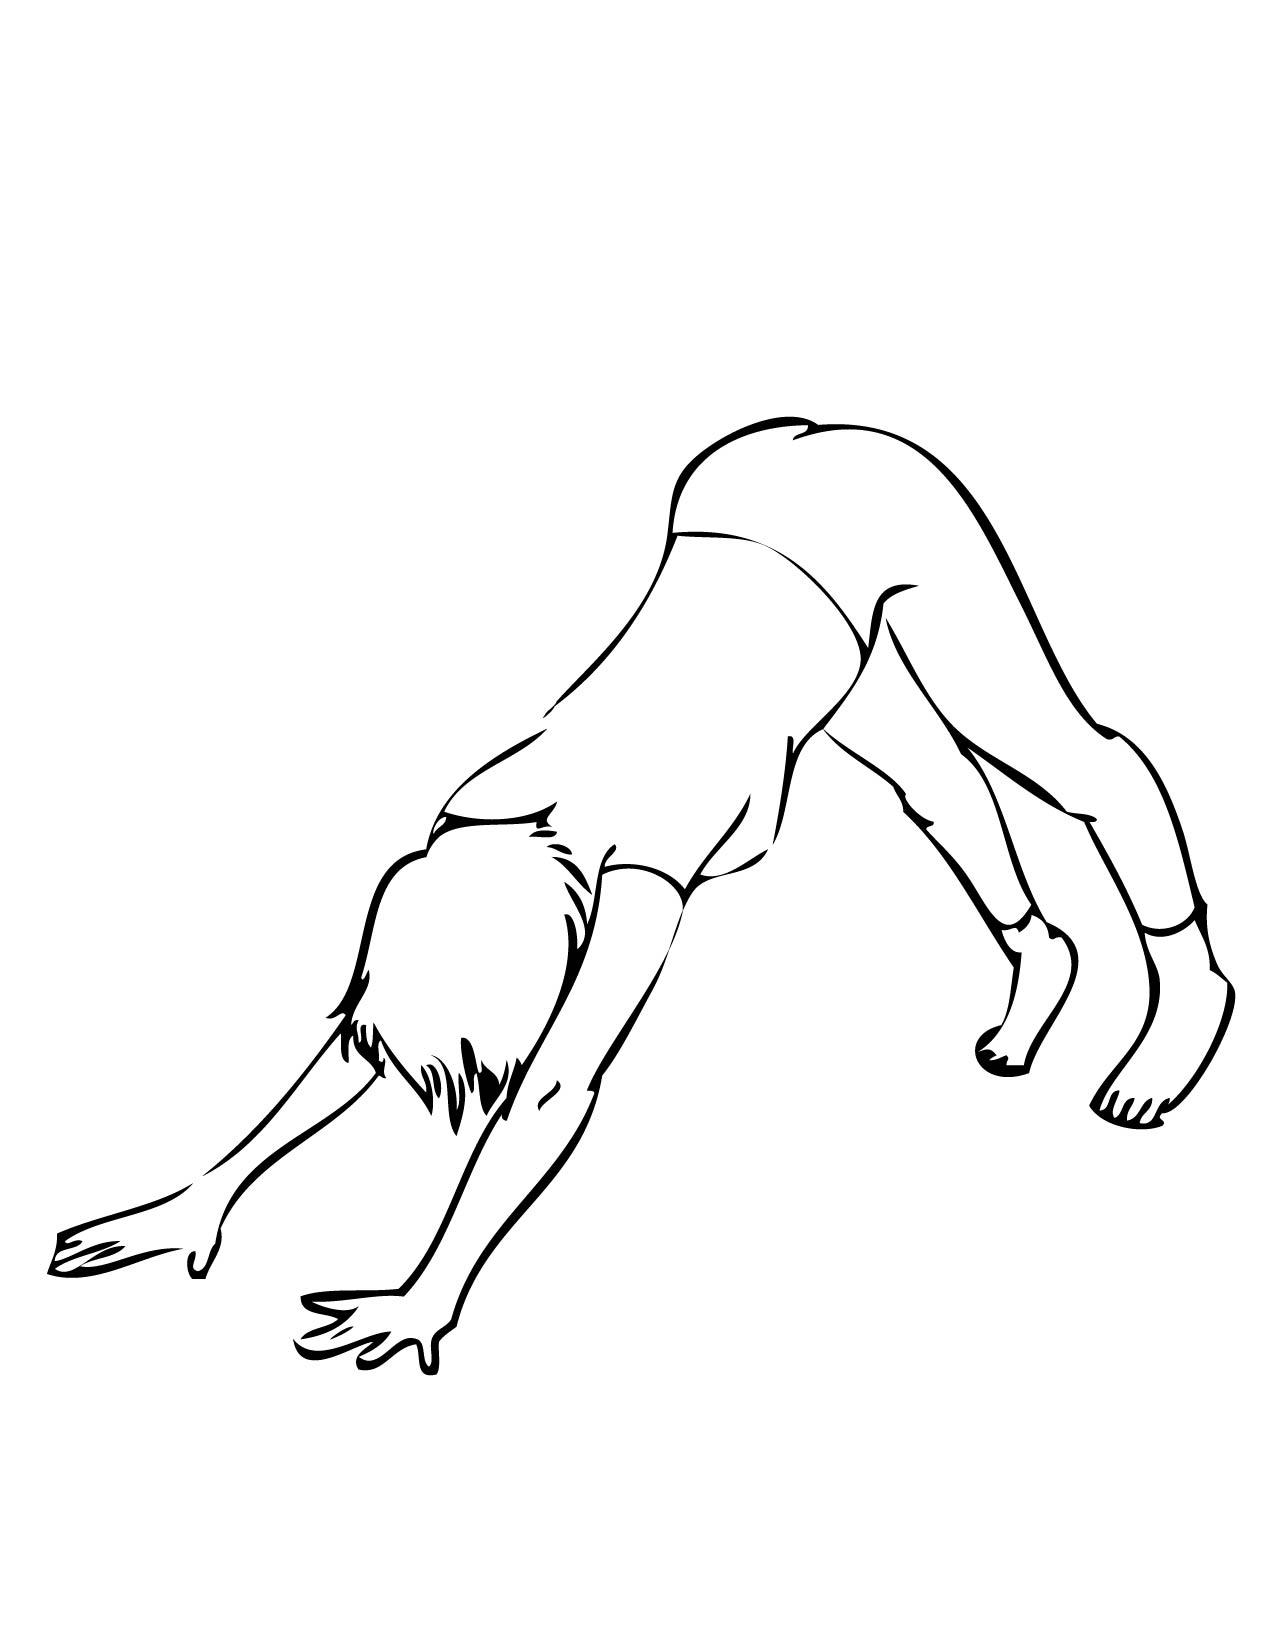 Coloring pages yoga - Downward Facing Dog